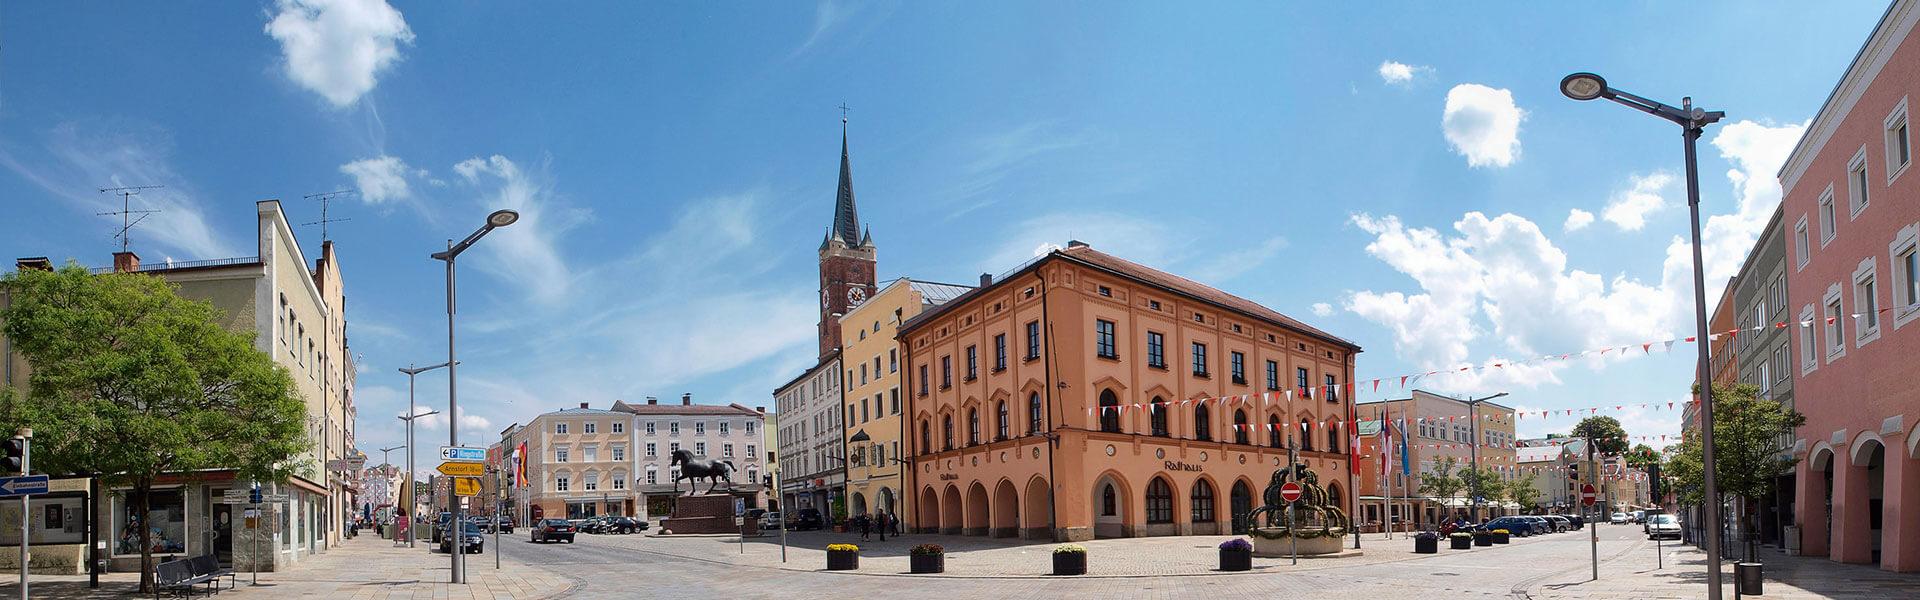 Rechtsanwaltskanzlei in Pfarrkirchen